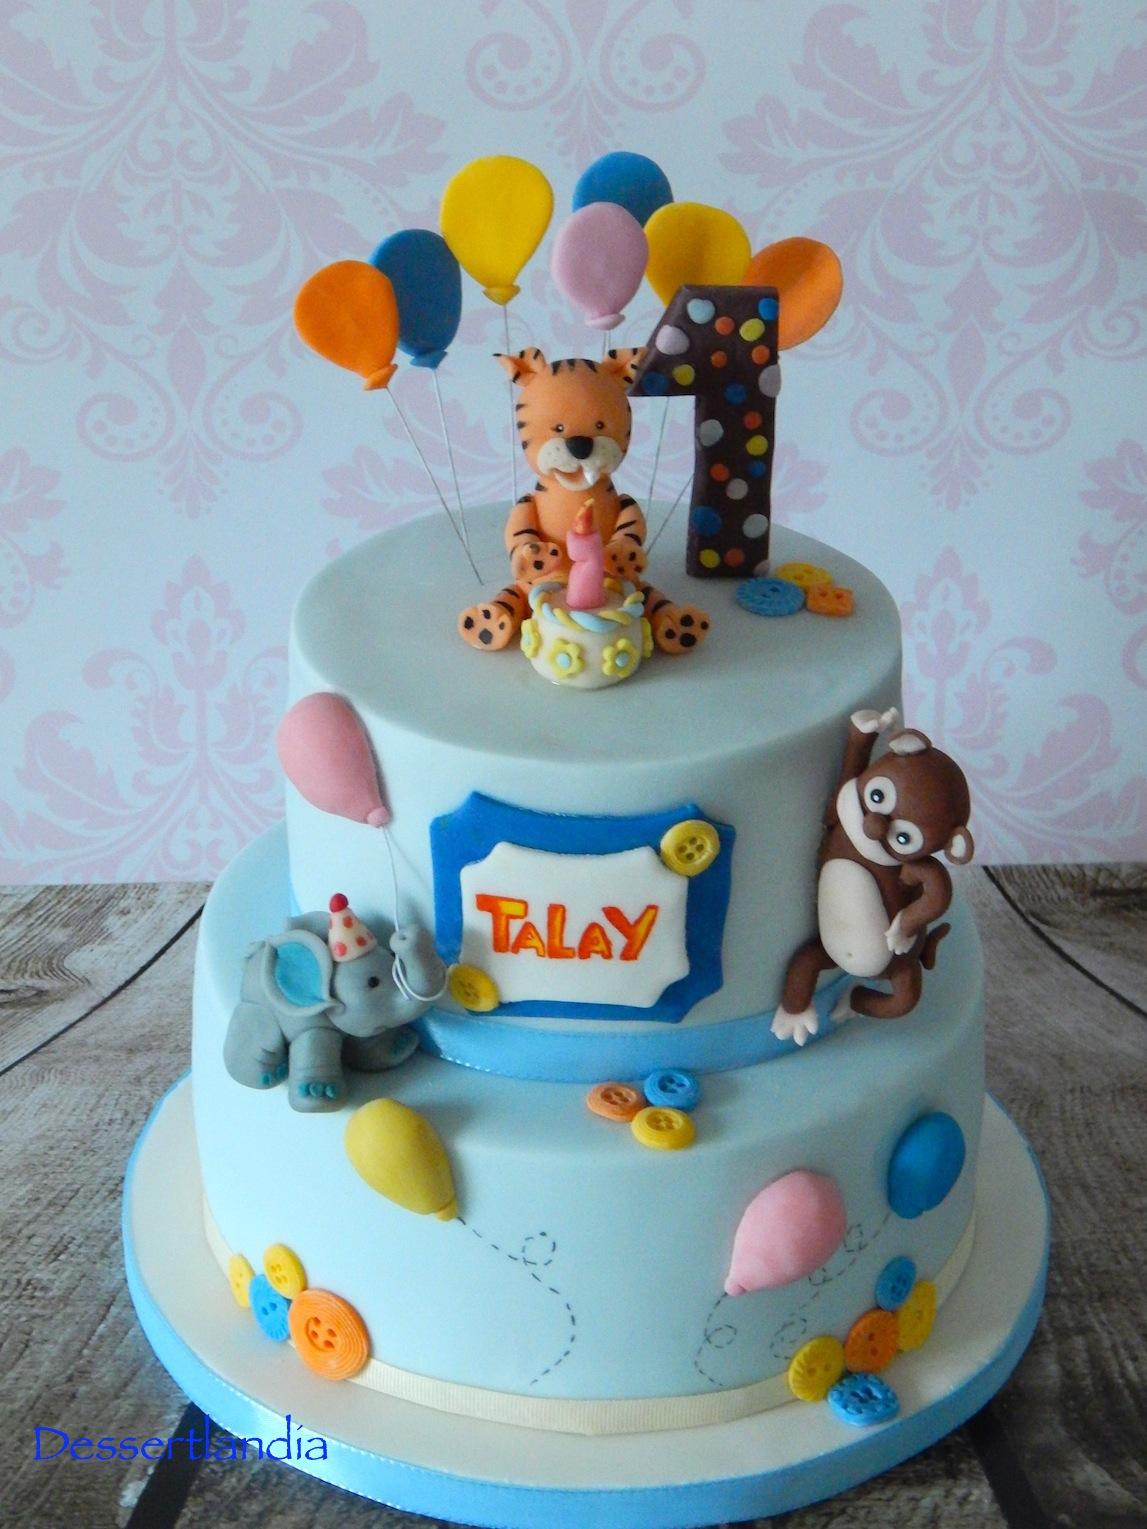 Dessertlandia My First 2 Tier Bday Cake